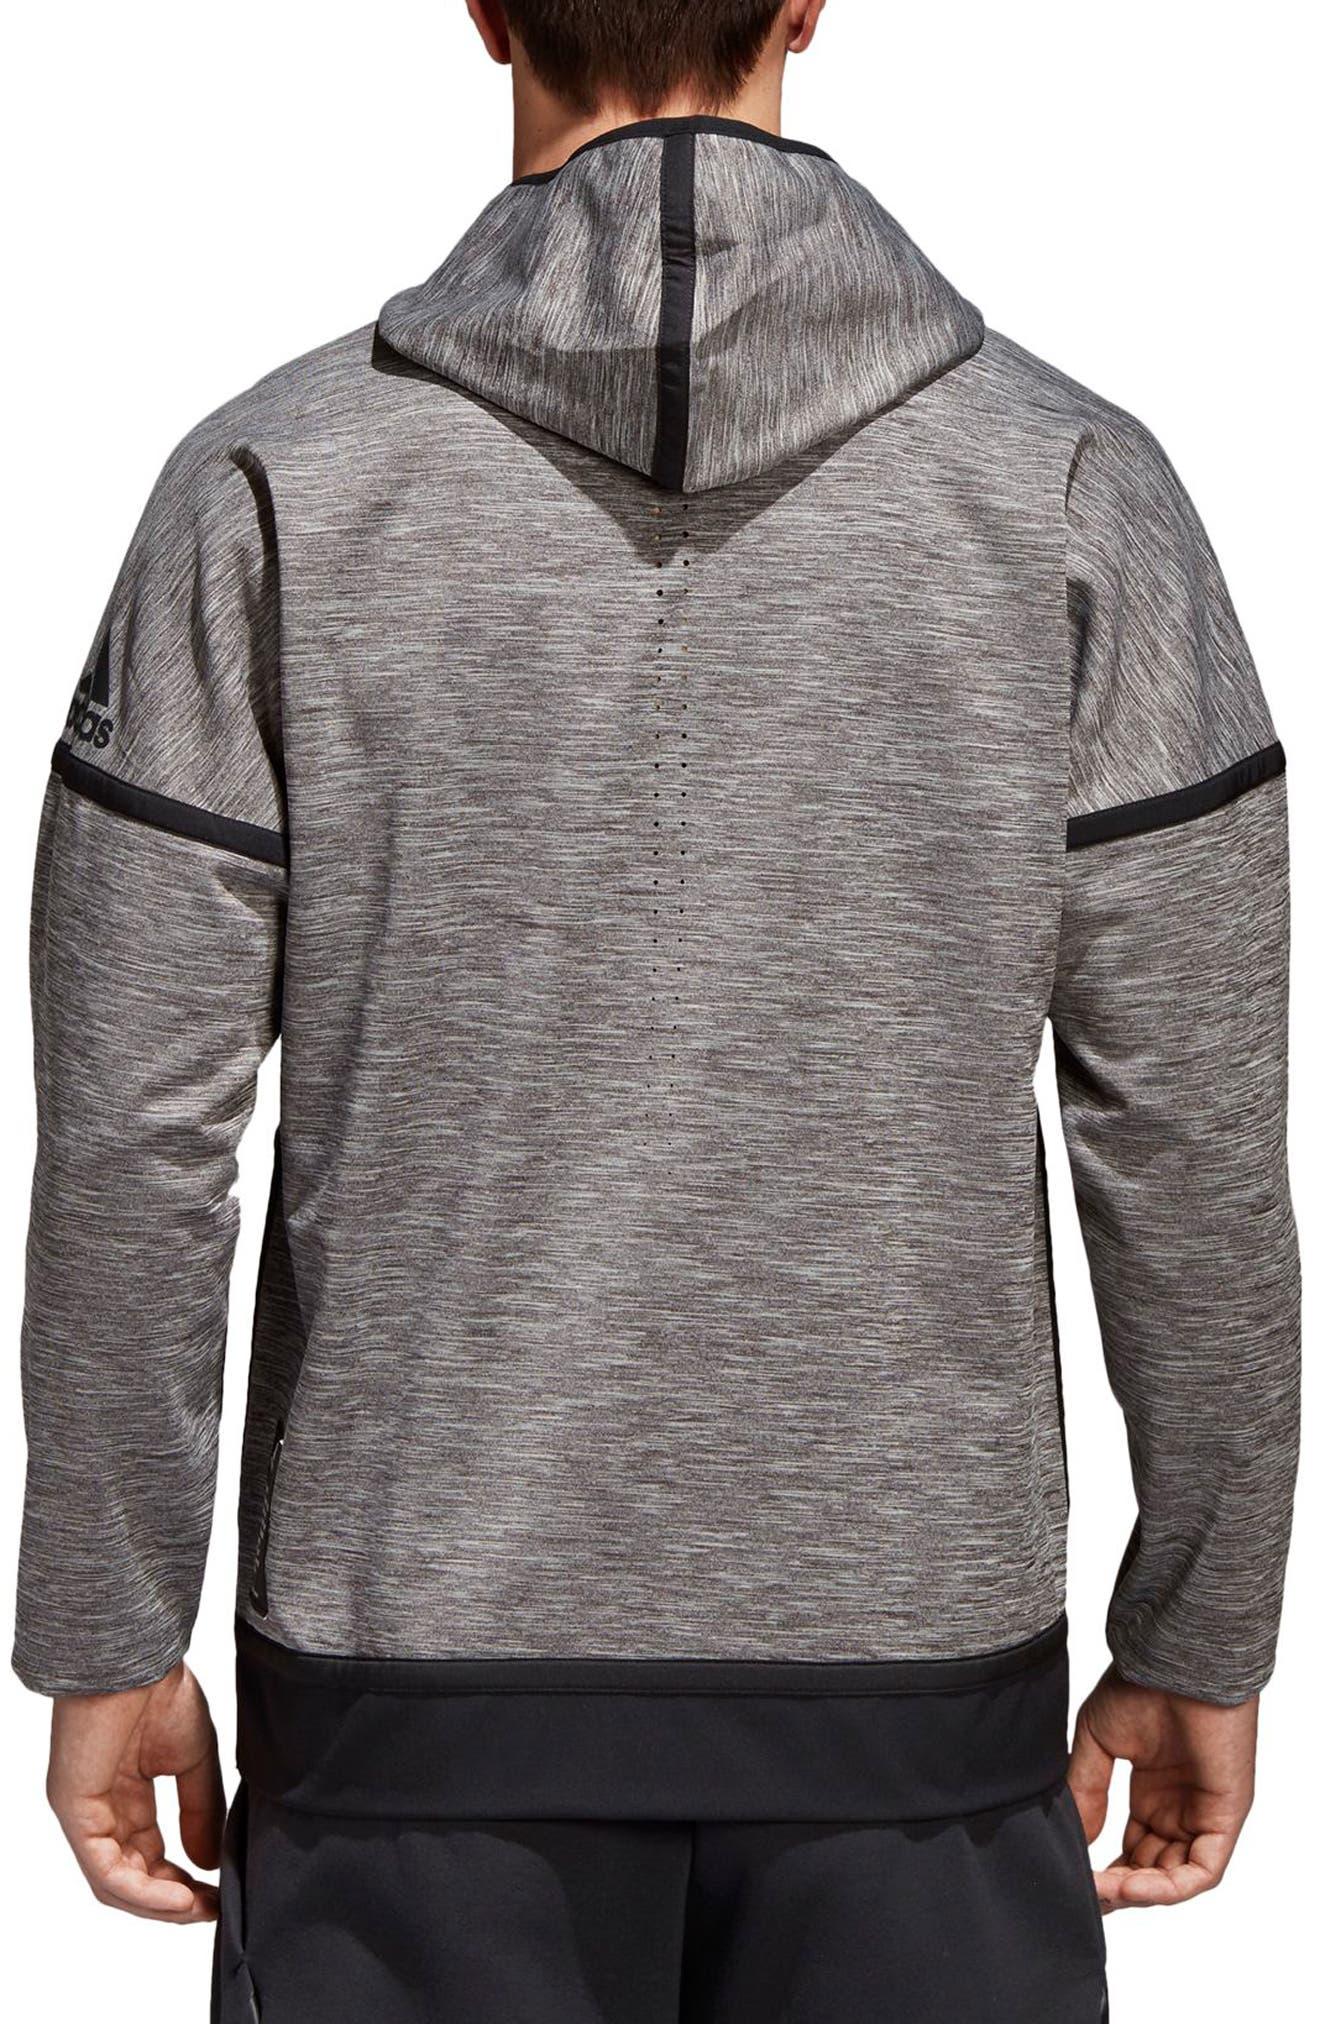 ZNE Regular Fit Reversible Hooded Jacket,                             Alternate thumbnail 2, color,                             Black / Storm Heather/ Mgh